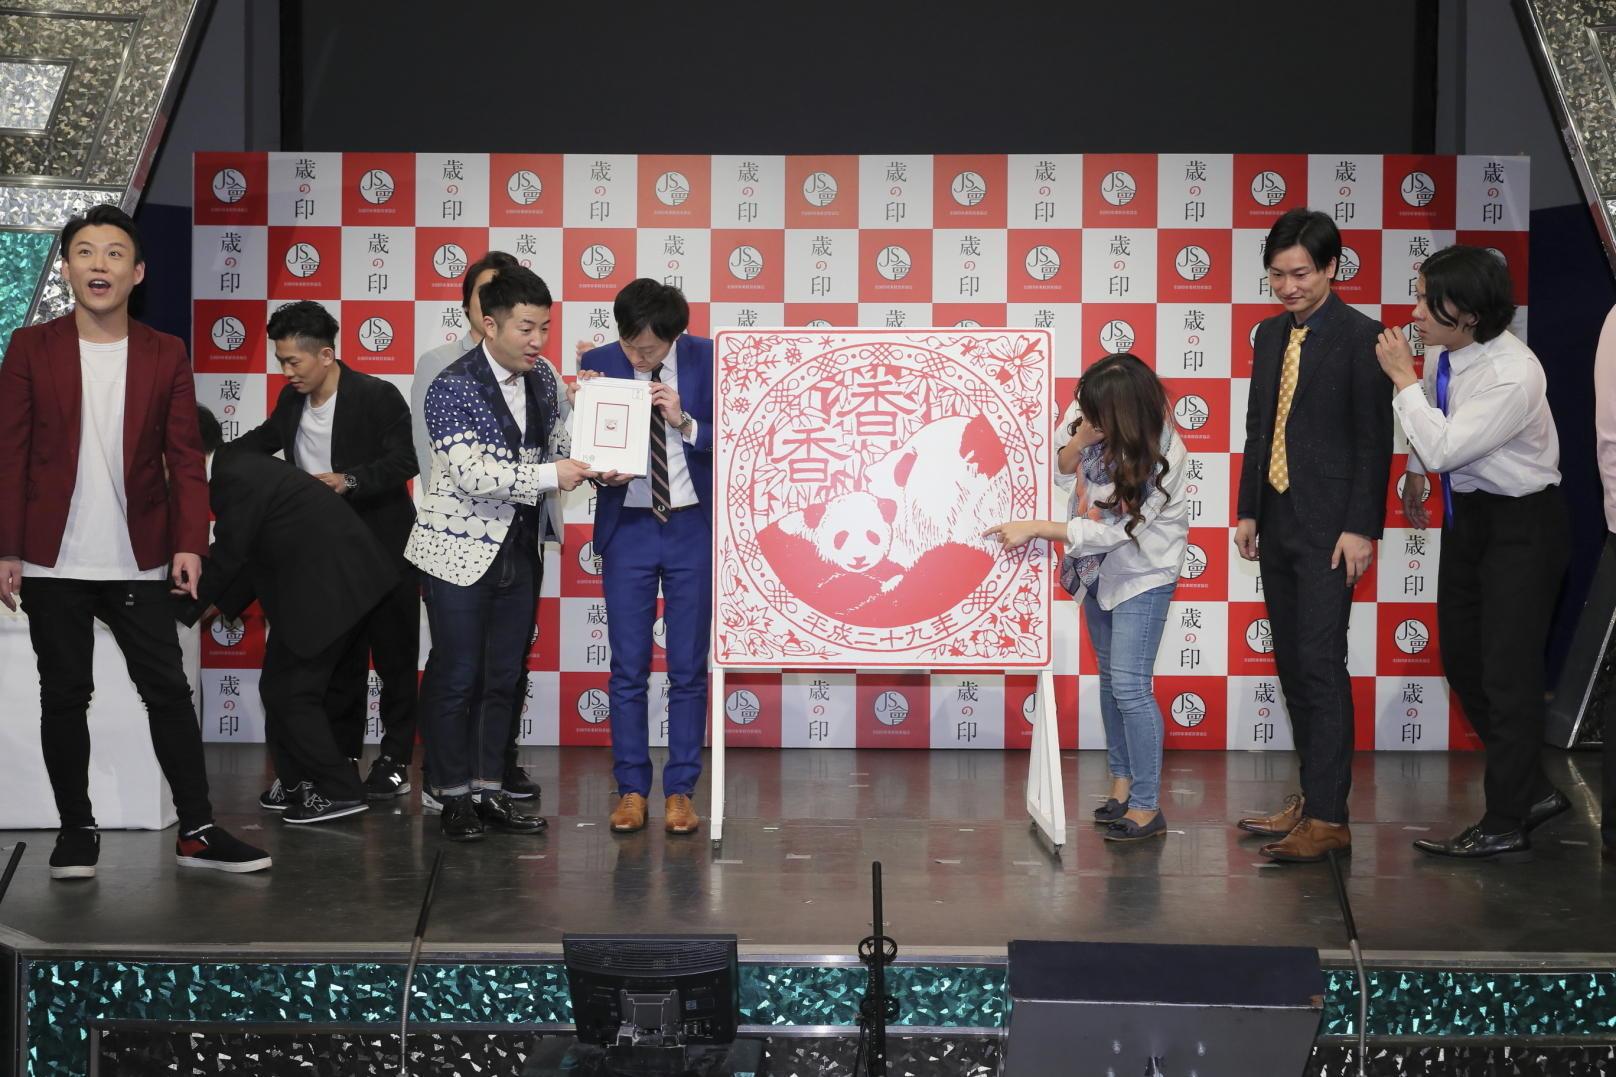 http://news.yoshimoto.co.jp/20171204171901-6652c551dfb13142663ce4ec1d96f9f526d29342.jpg